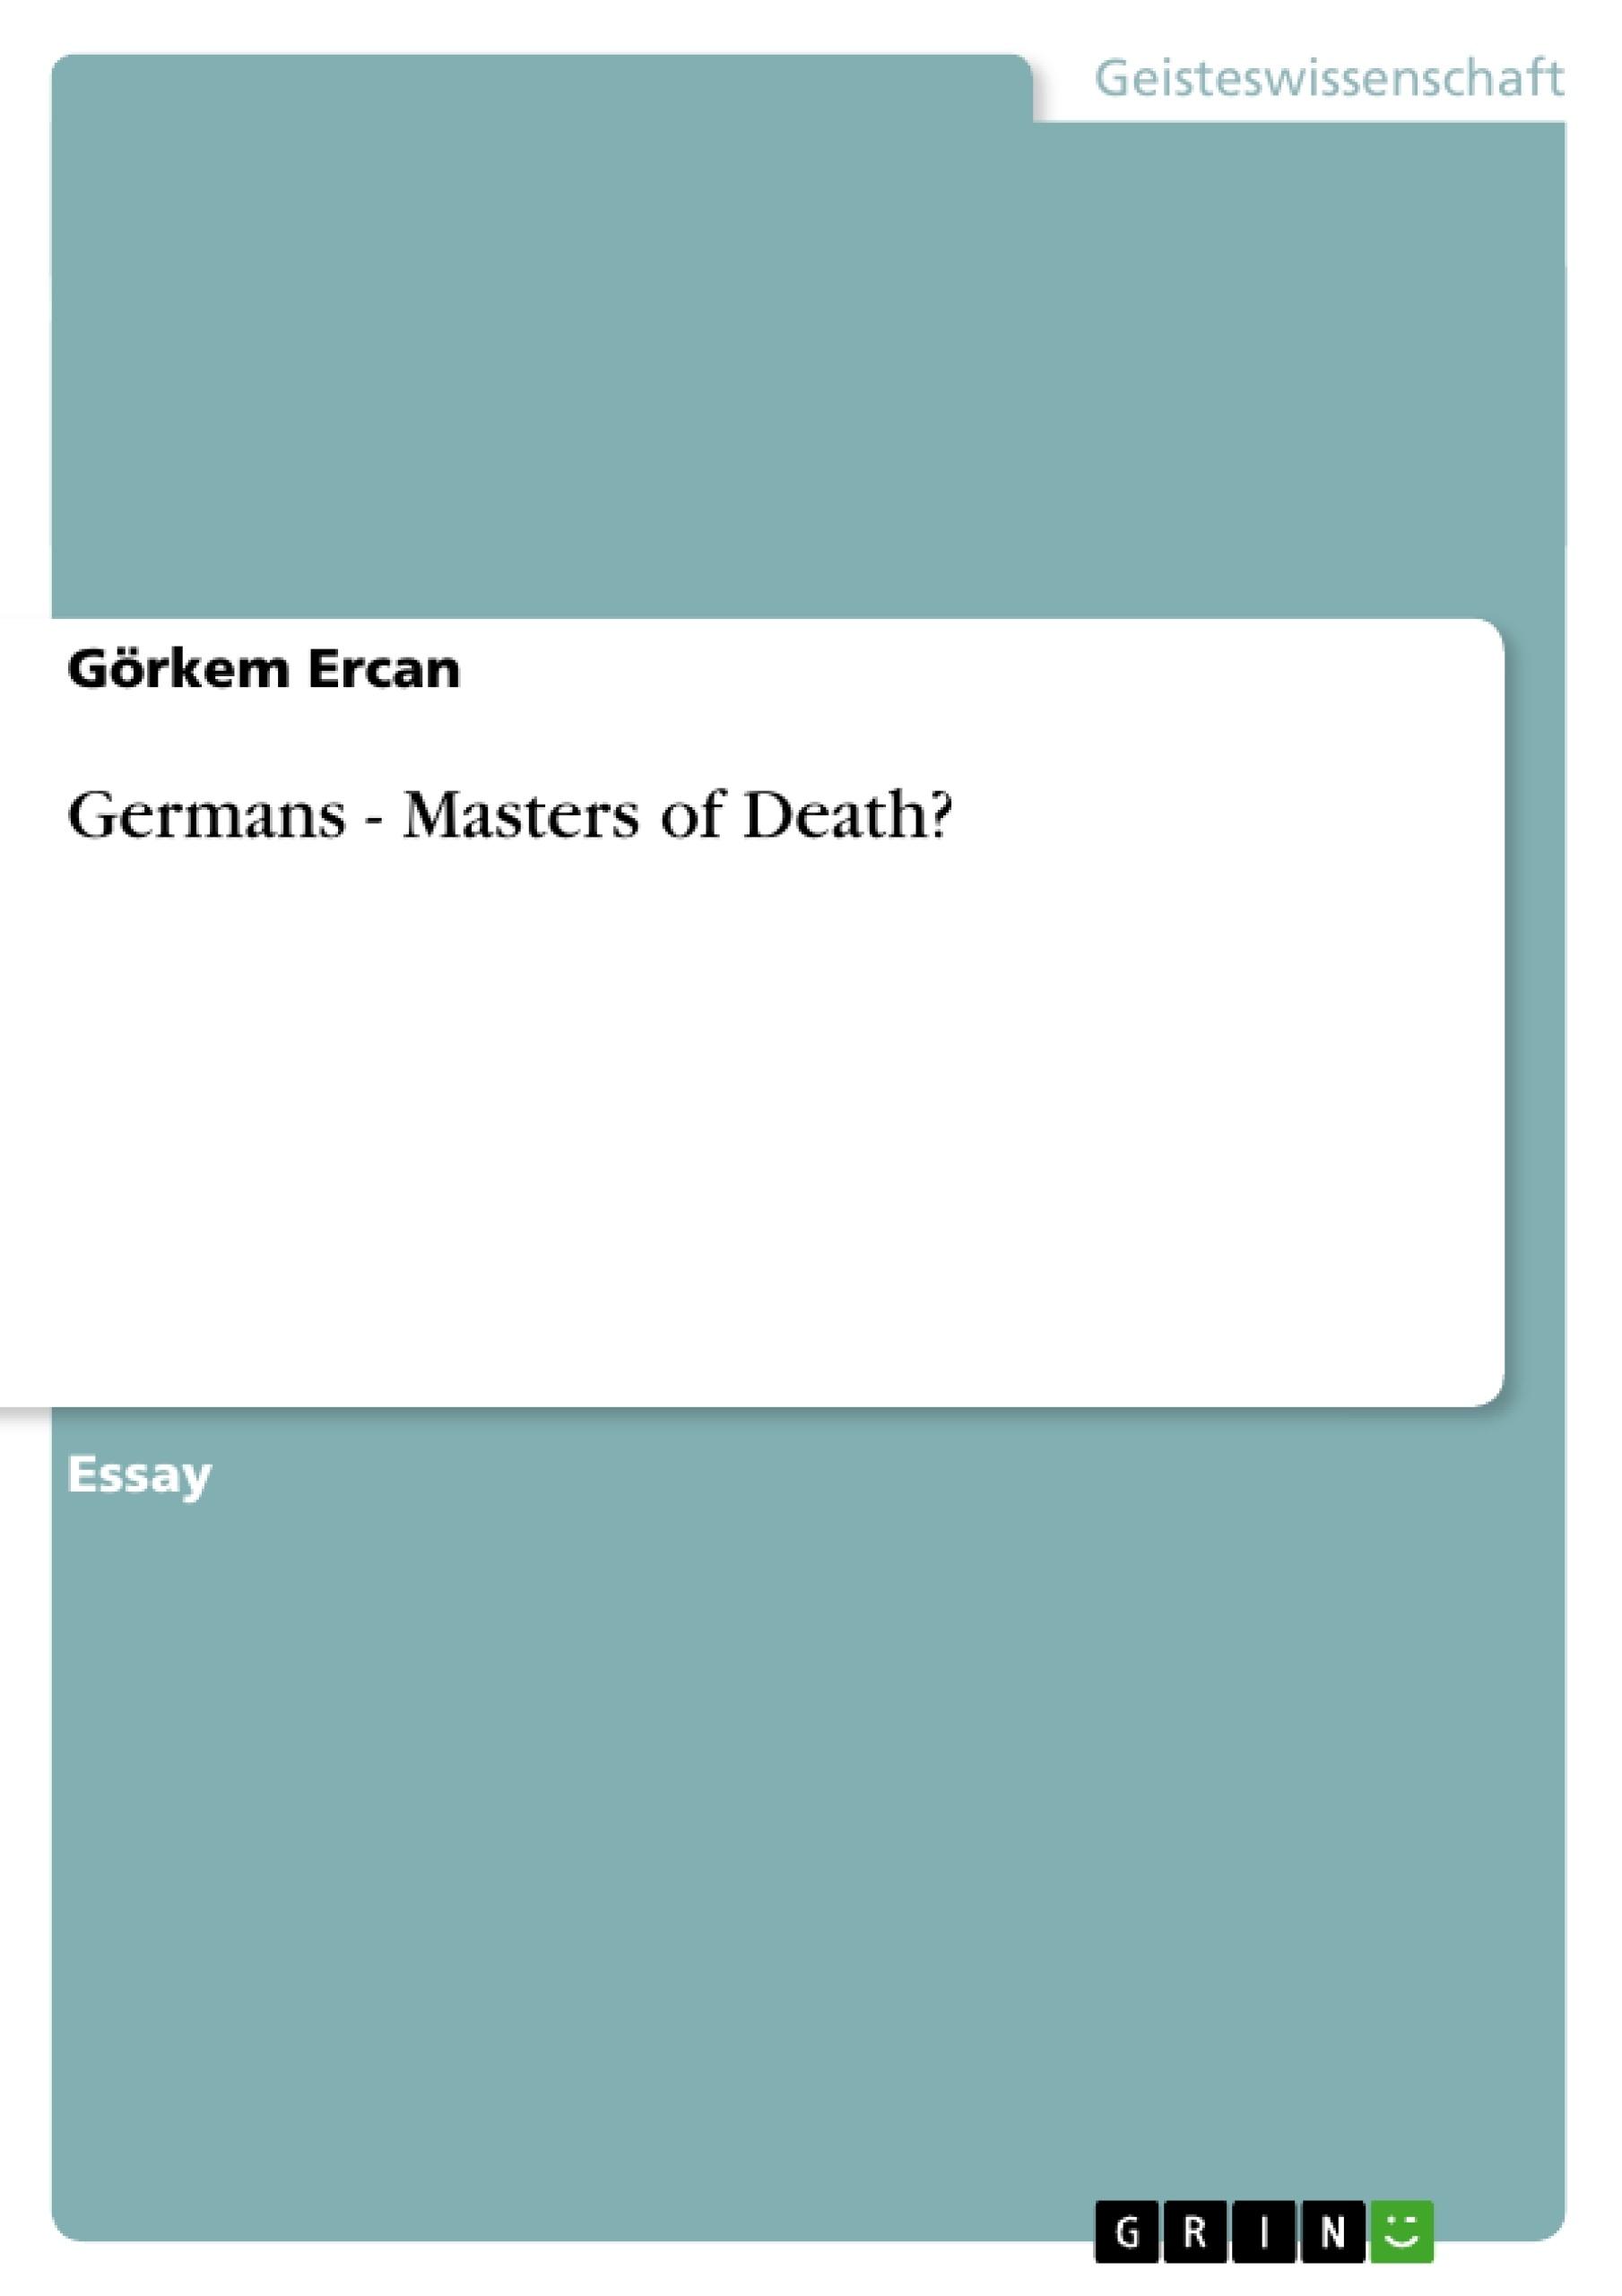 Titel: Germans - Masters of Death?